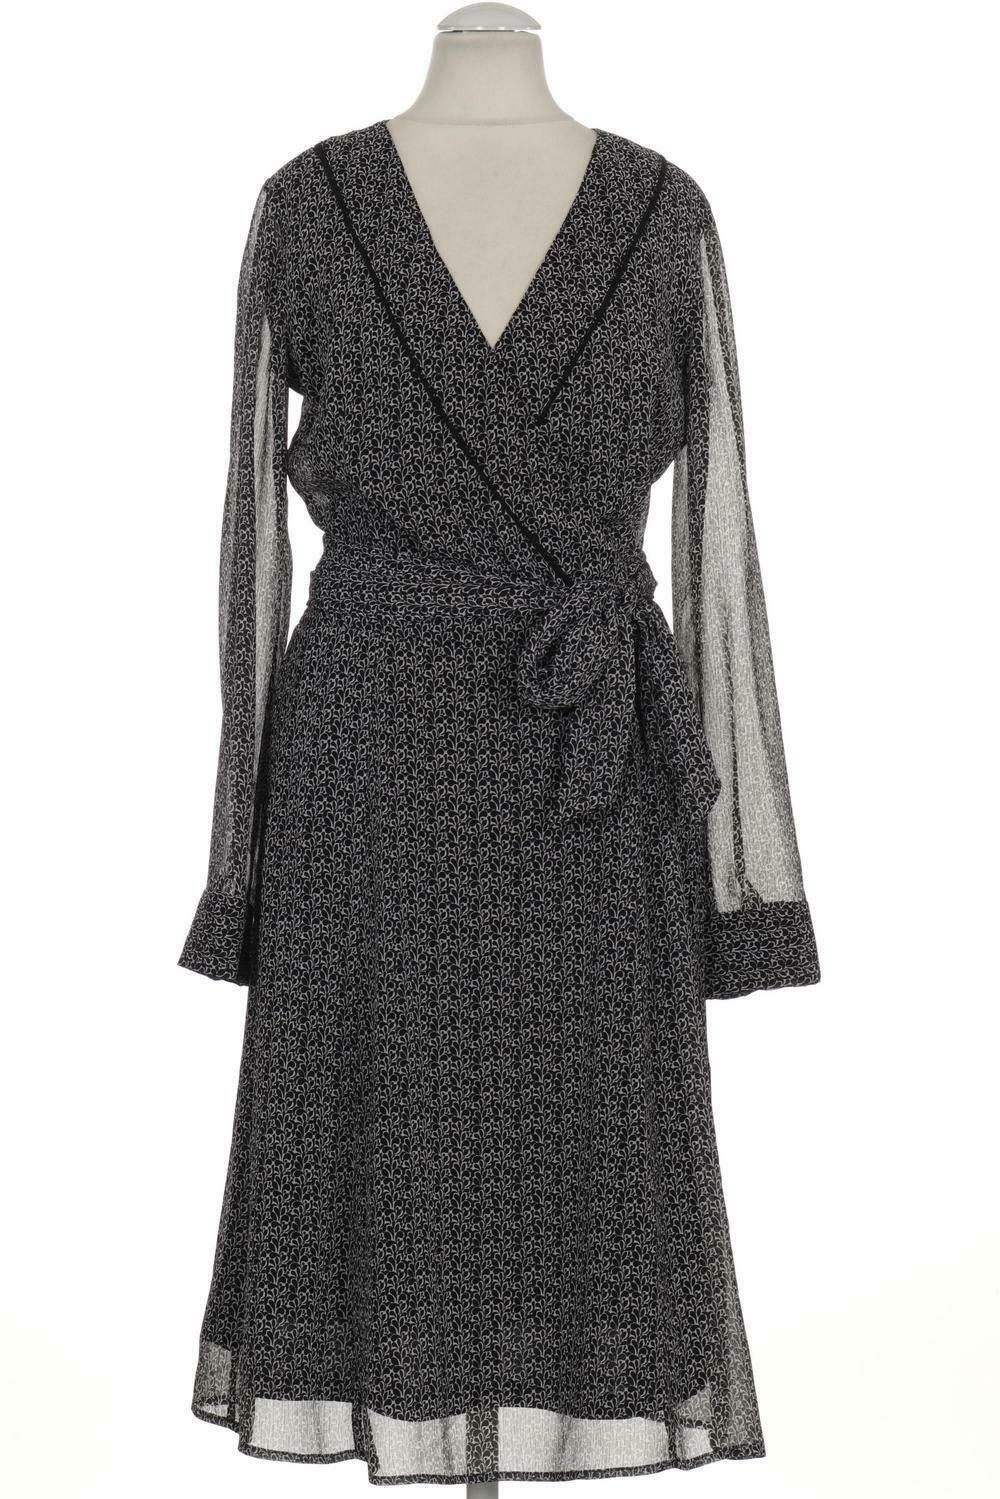 Esprit Kleid Damen Dress Damenkleid Gr. DE 34 Viskose ...